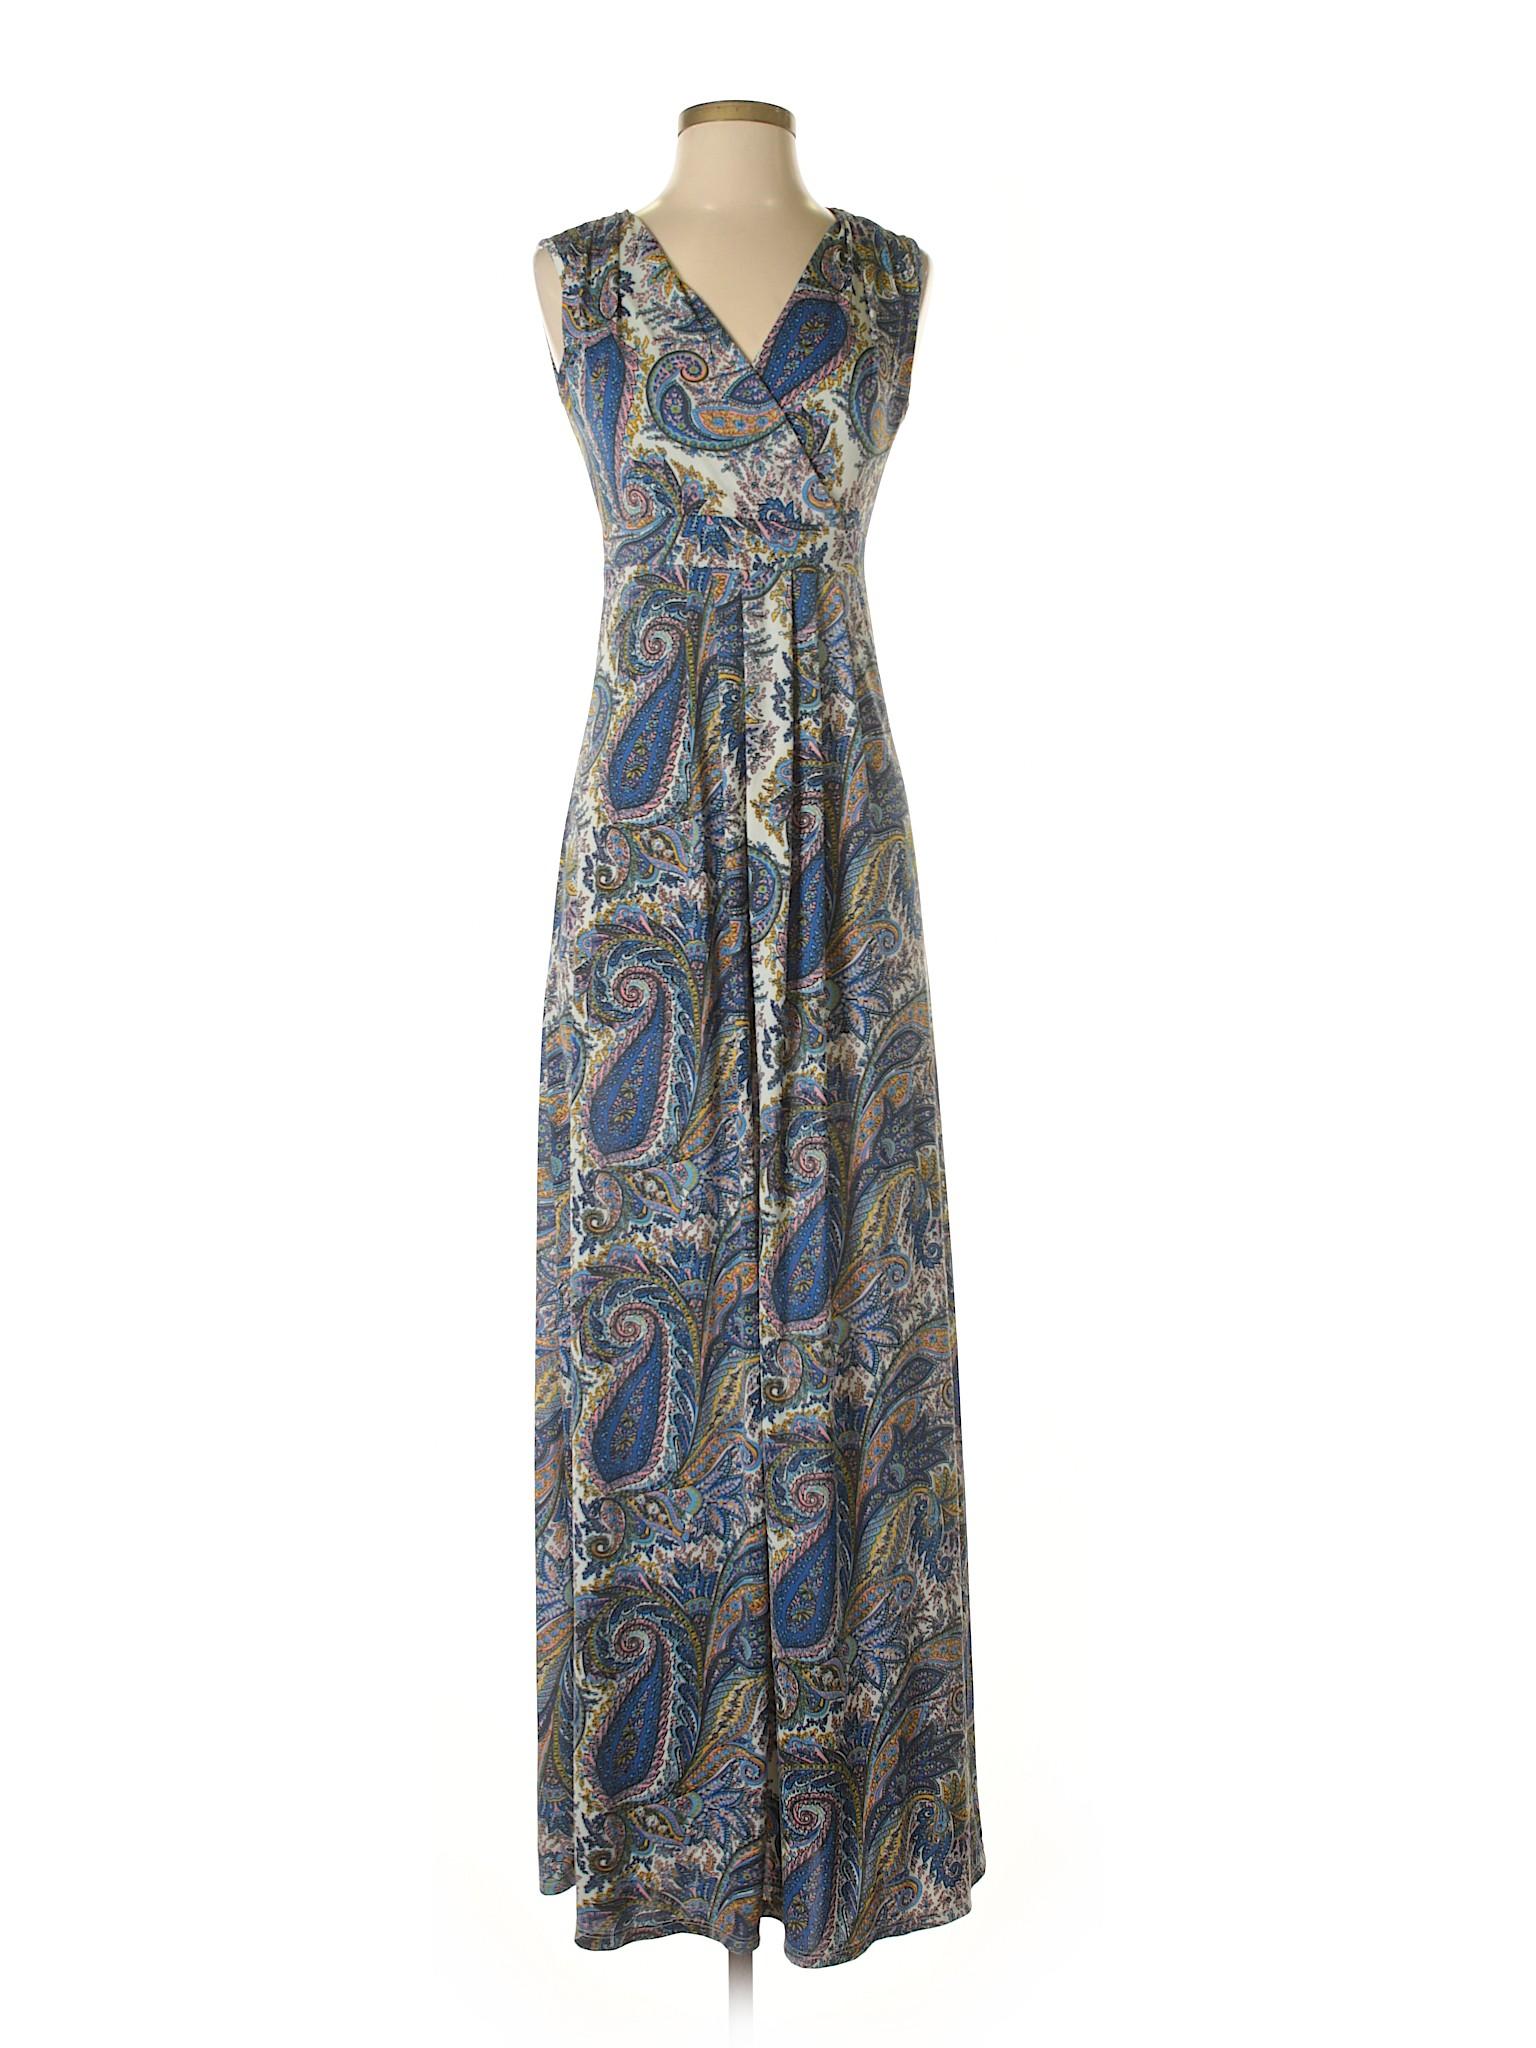 Casual Moda Selling Selling International Moda Dress xPwpSfRSIq